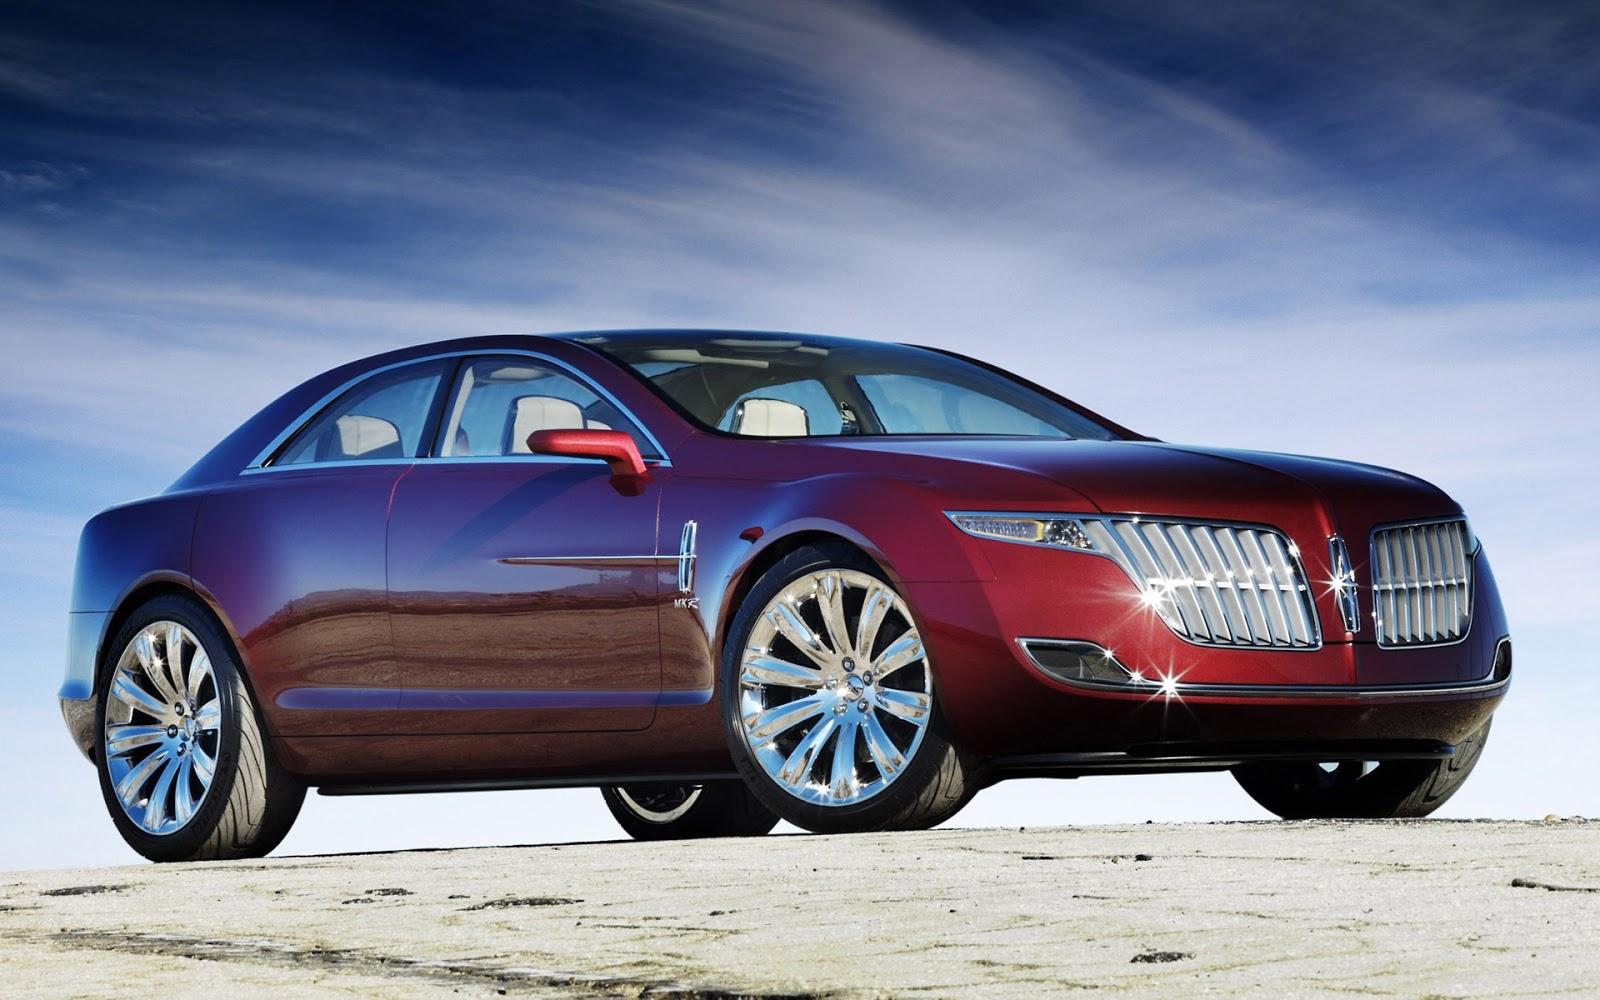 ultra hd wallpapers 8k cars,land vehicle,vehicle,car,luxury vehicle,automotive design